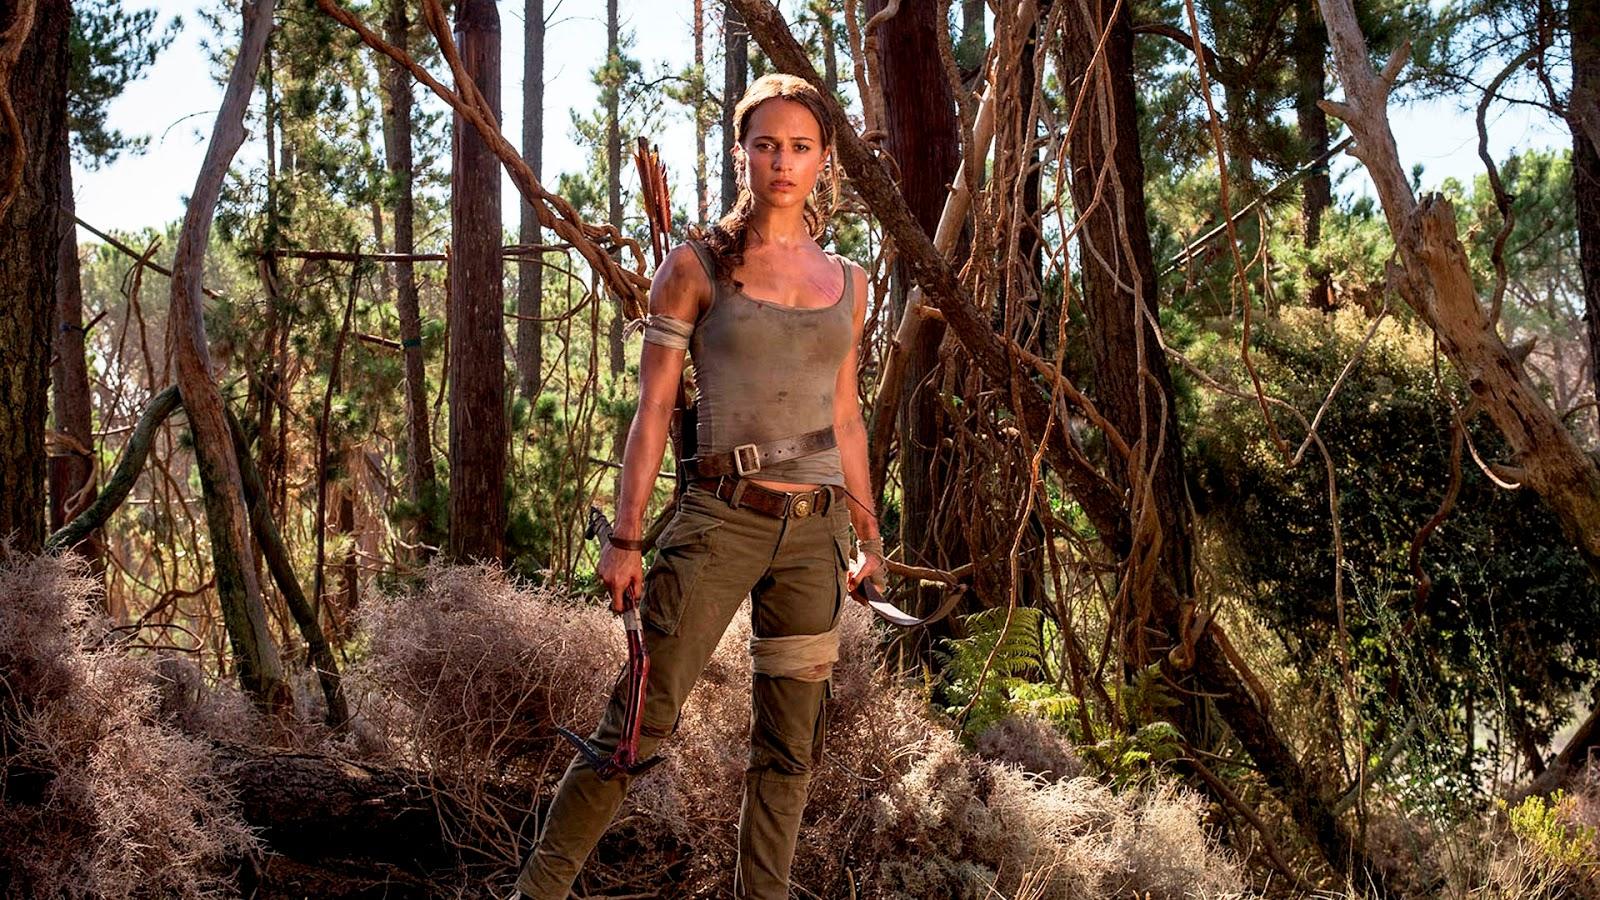 Tomb Raider Director Roar Uthaug On Why Lara Croft Is A Hero For